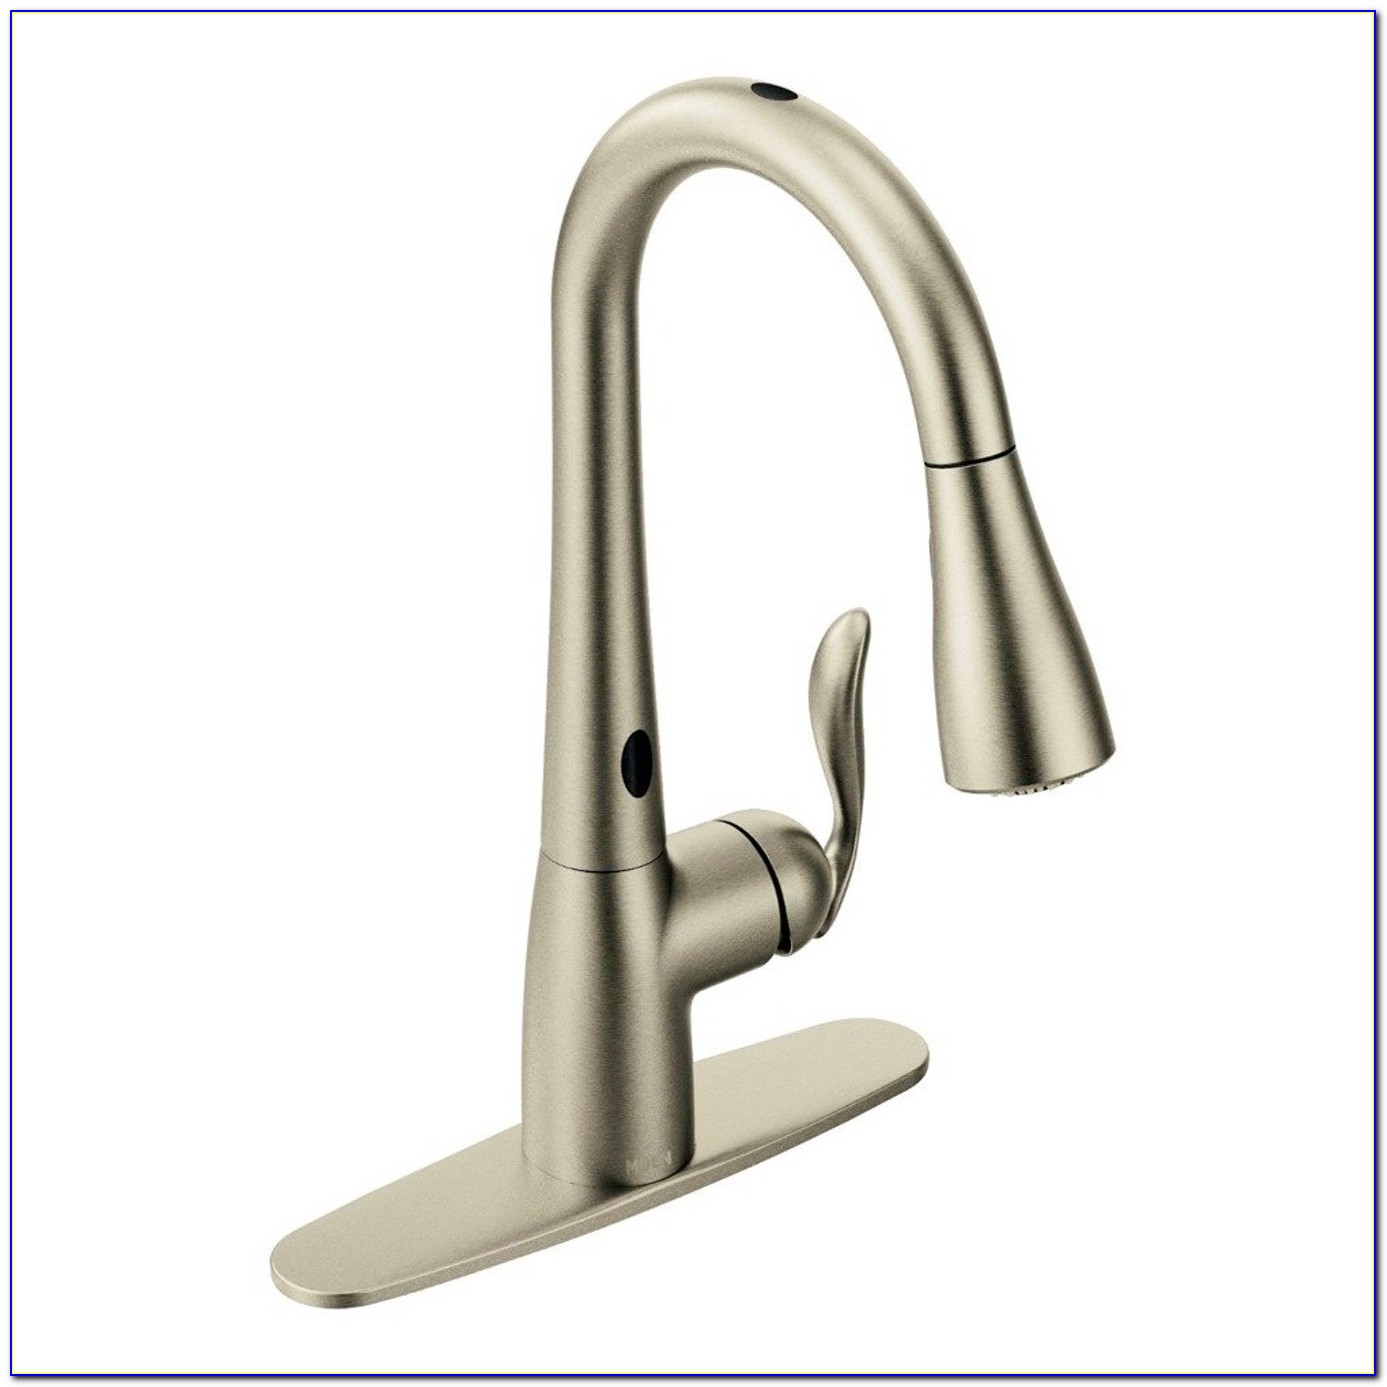 Delta Hands Free Kitchen Faucet